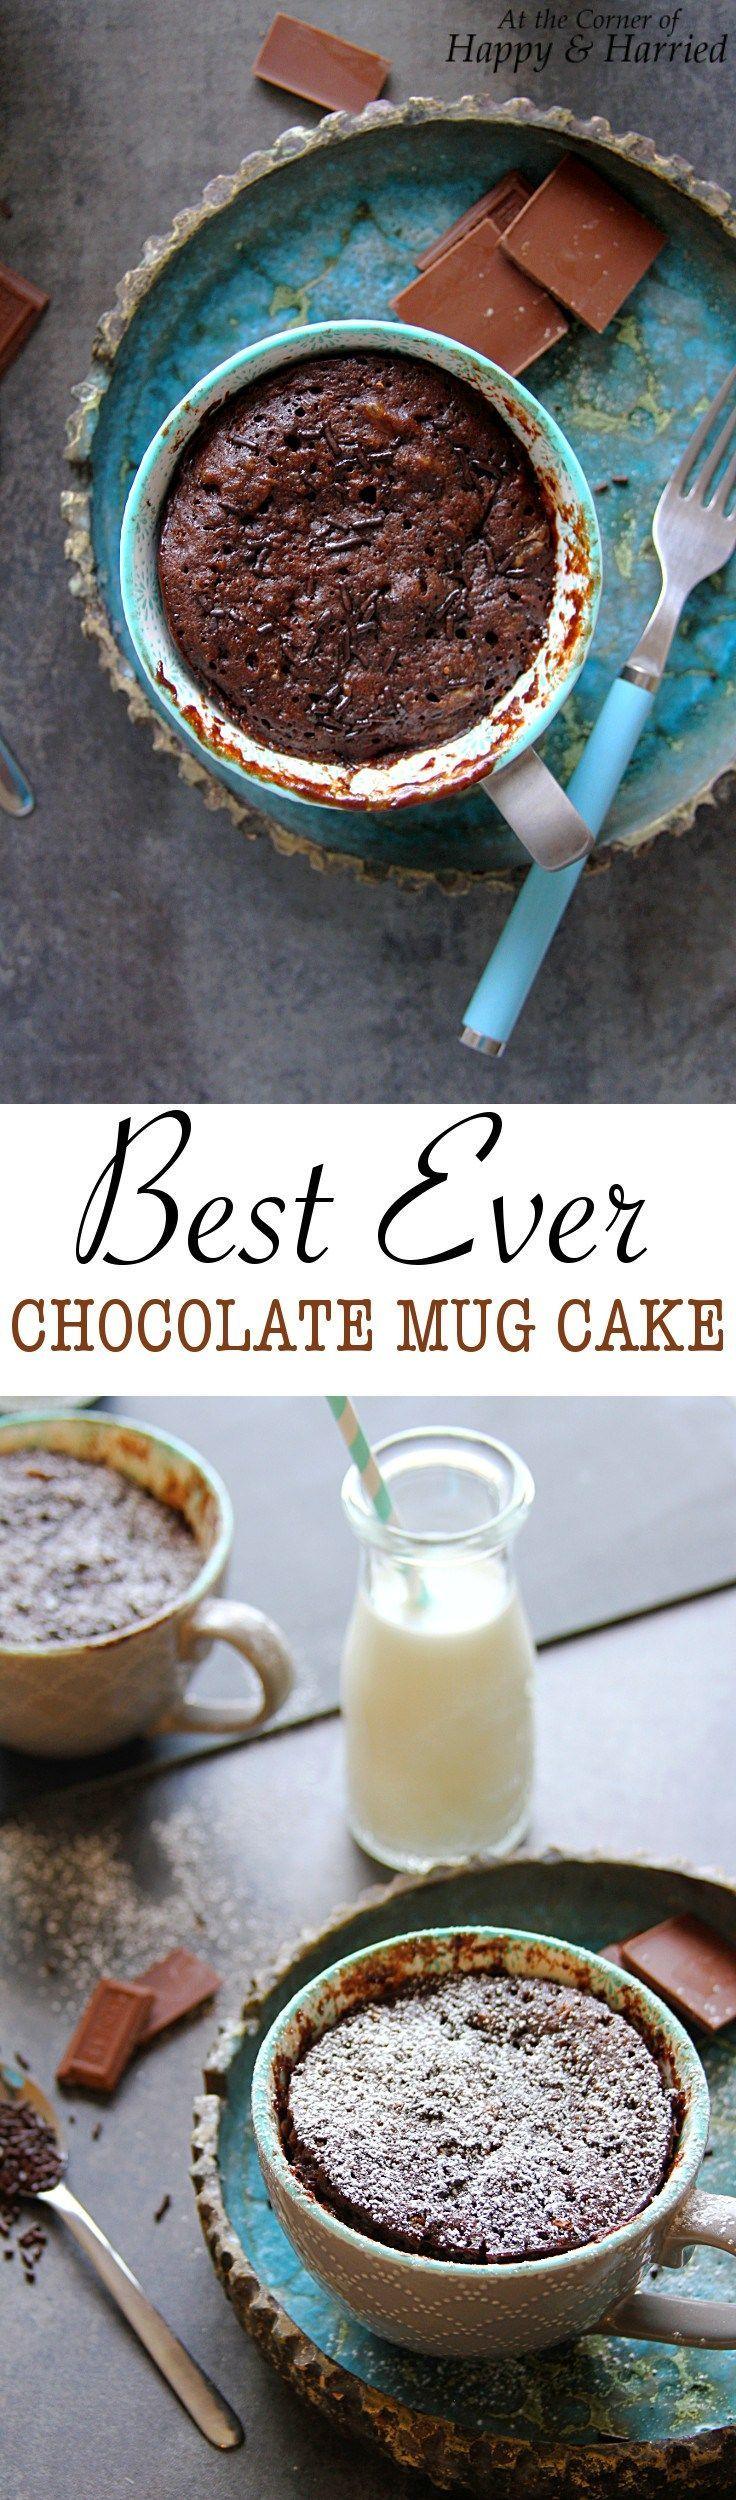 BEST EVER CHOCOLATE MUG CAKE - HAPPY